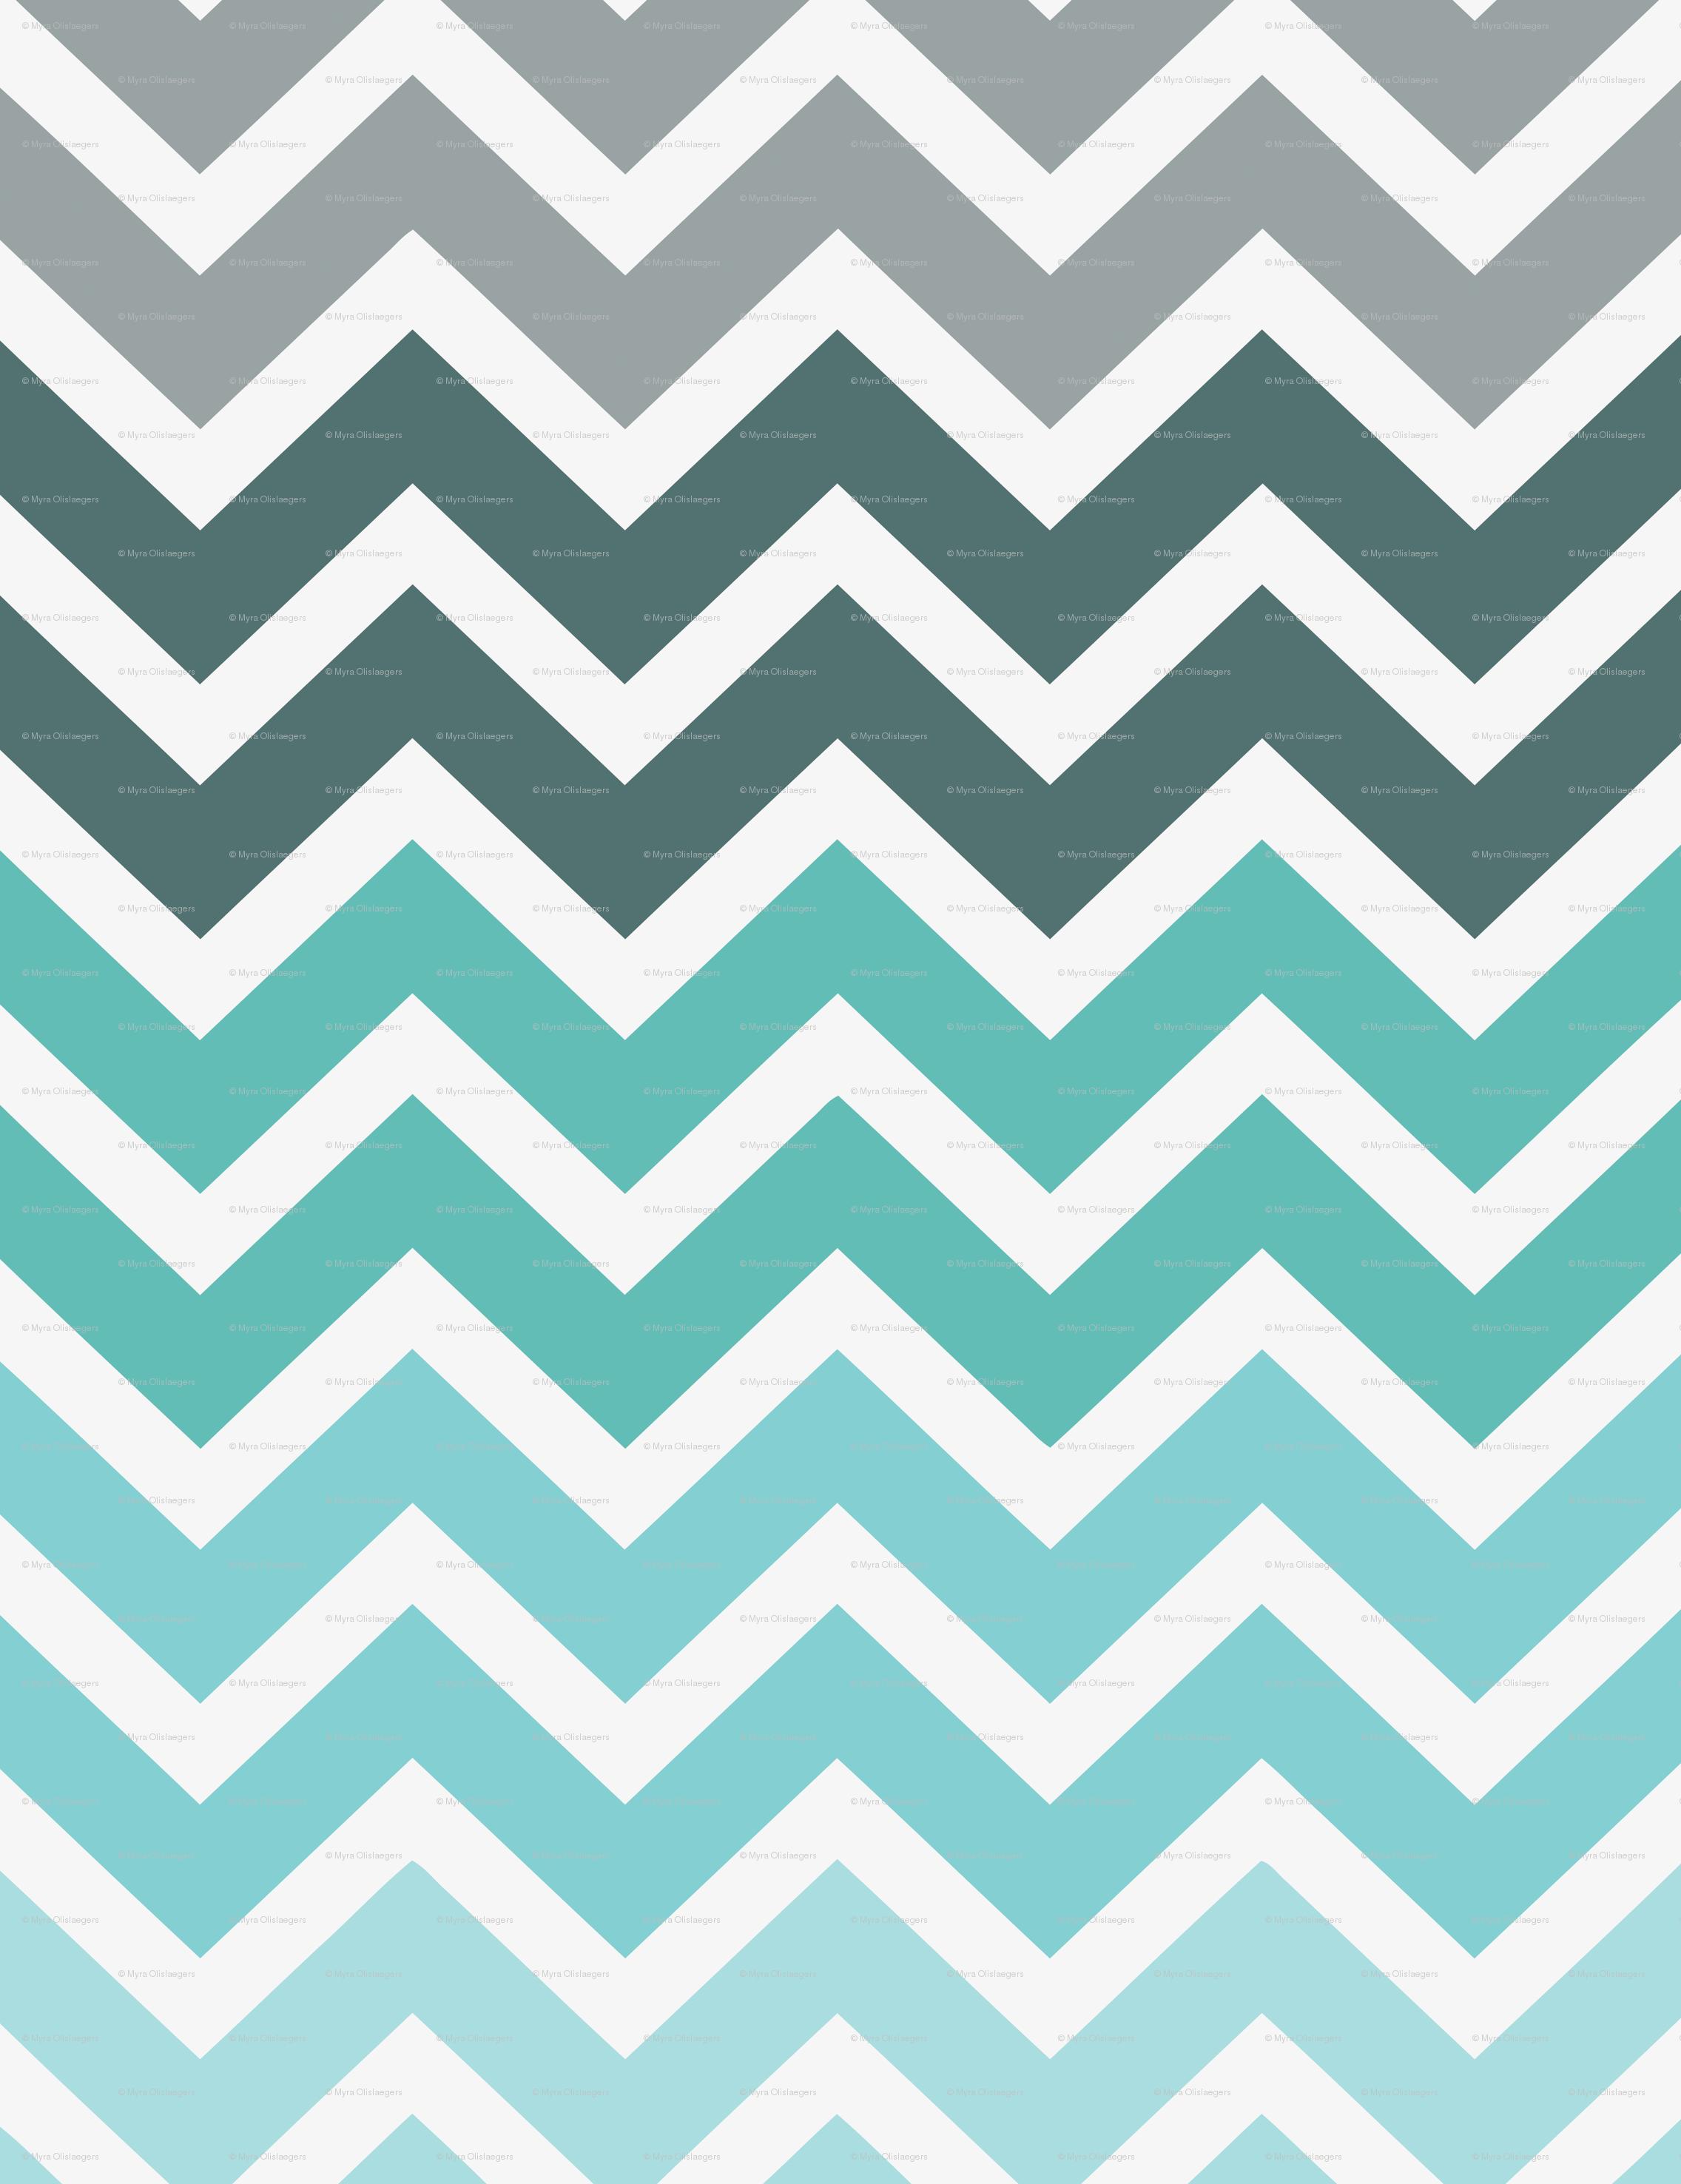 Rrchevron Ombre Highres Png 2272 2952 Iphone Background Pattern Pattern Art Chevron Wallpaper